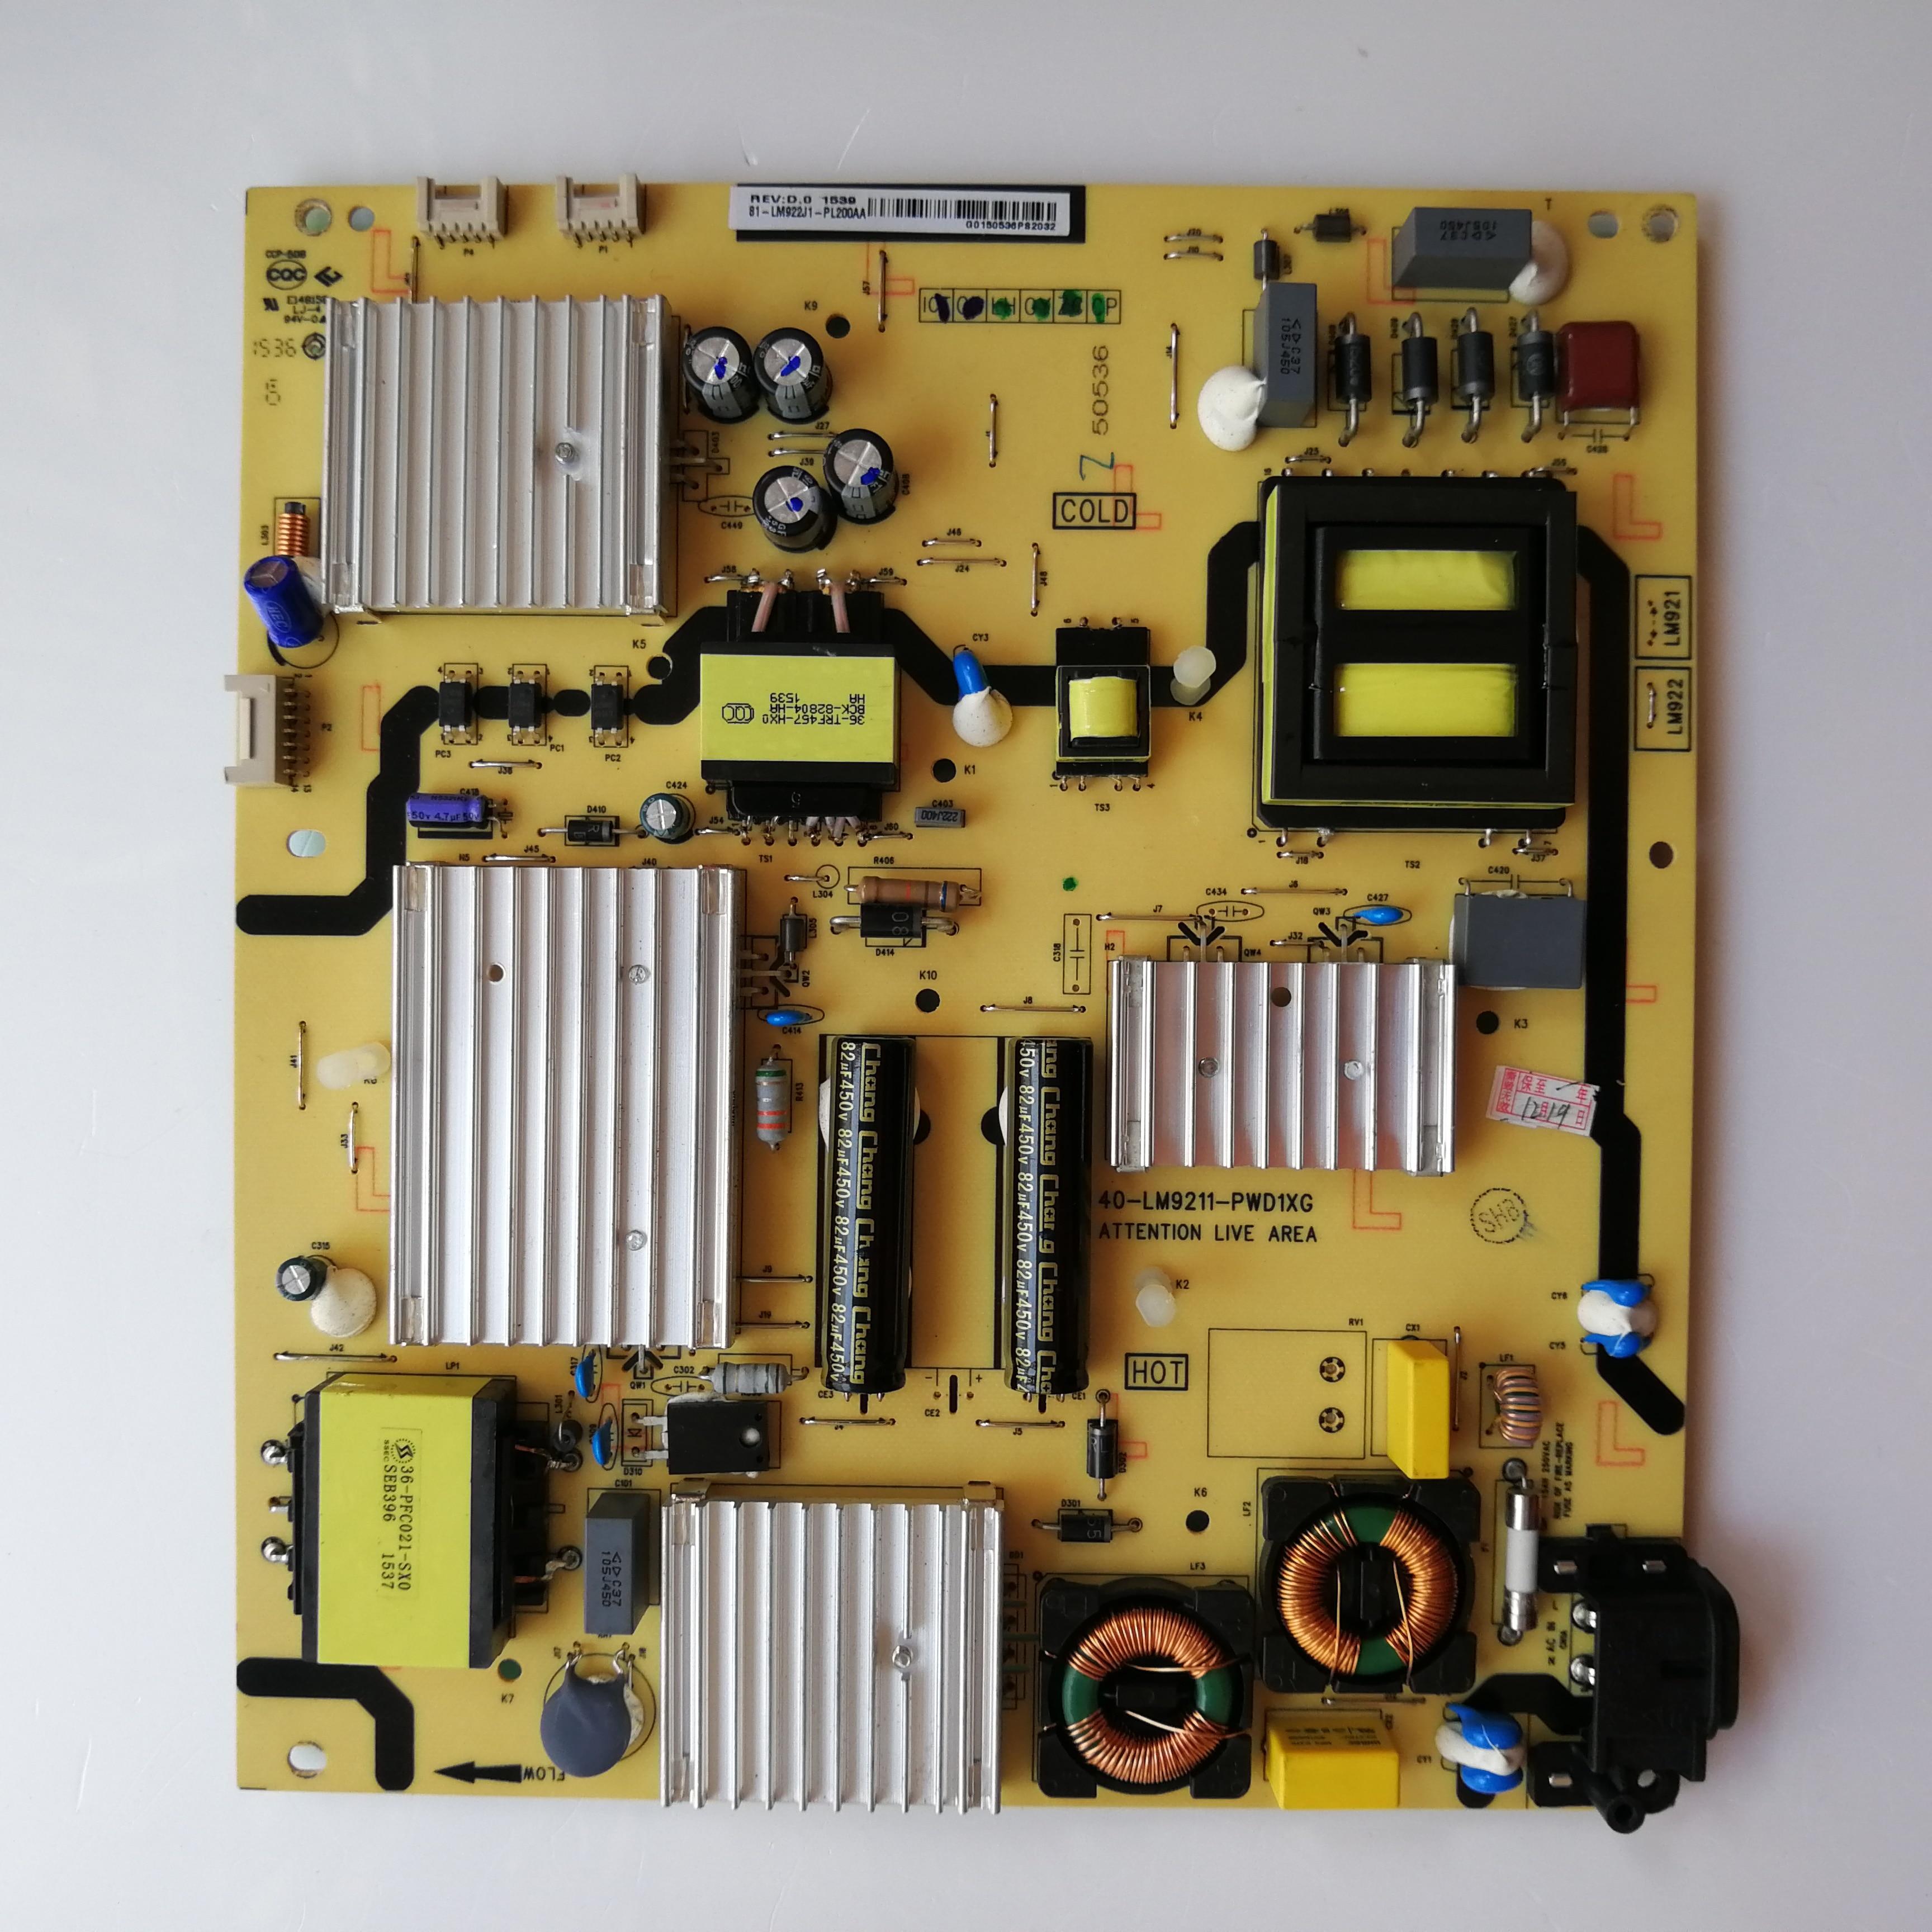 New Original Power Supply Board 81-LM922J1-PL210AA 40-LM9211-PWD1XG Good Working